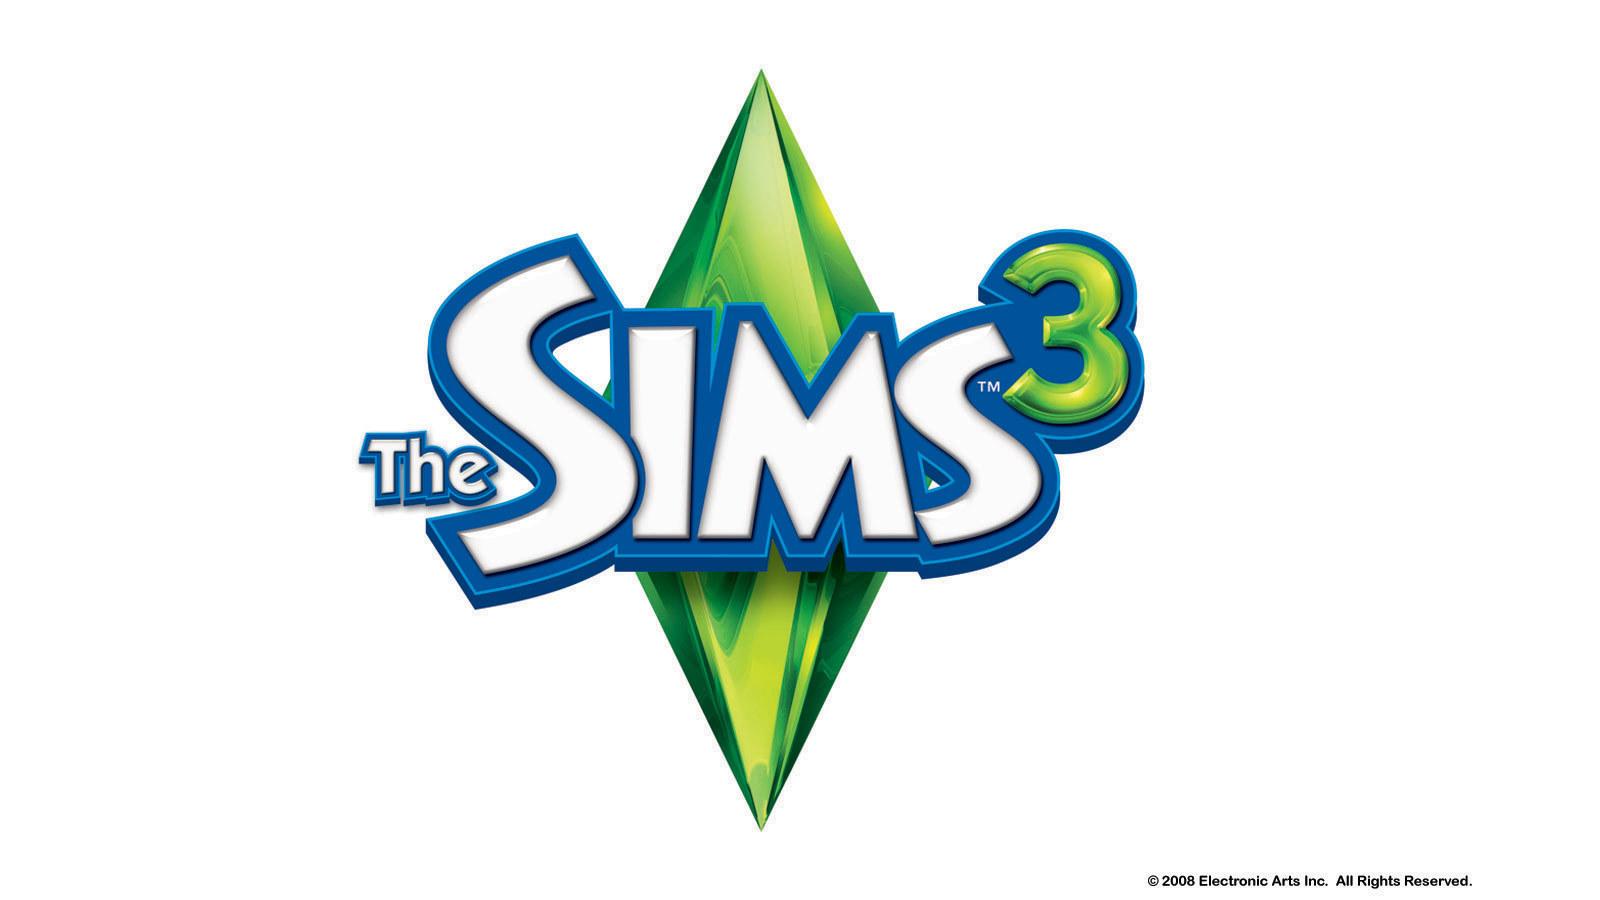 The sims 3 интересные семьи - a6f5d